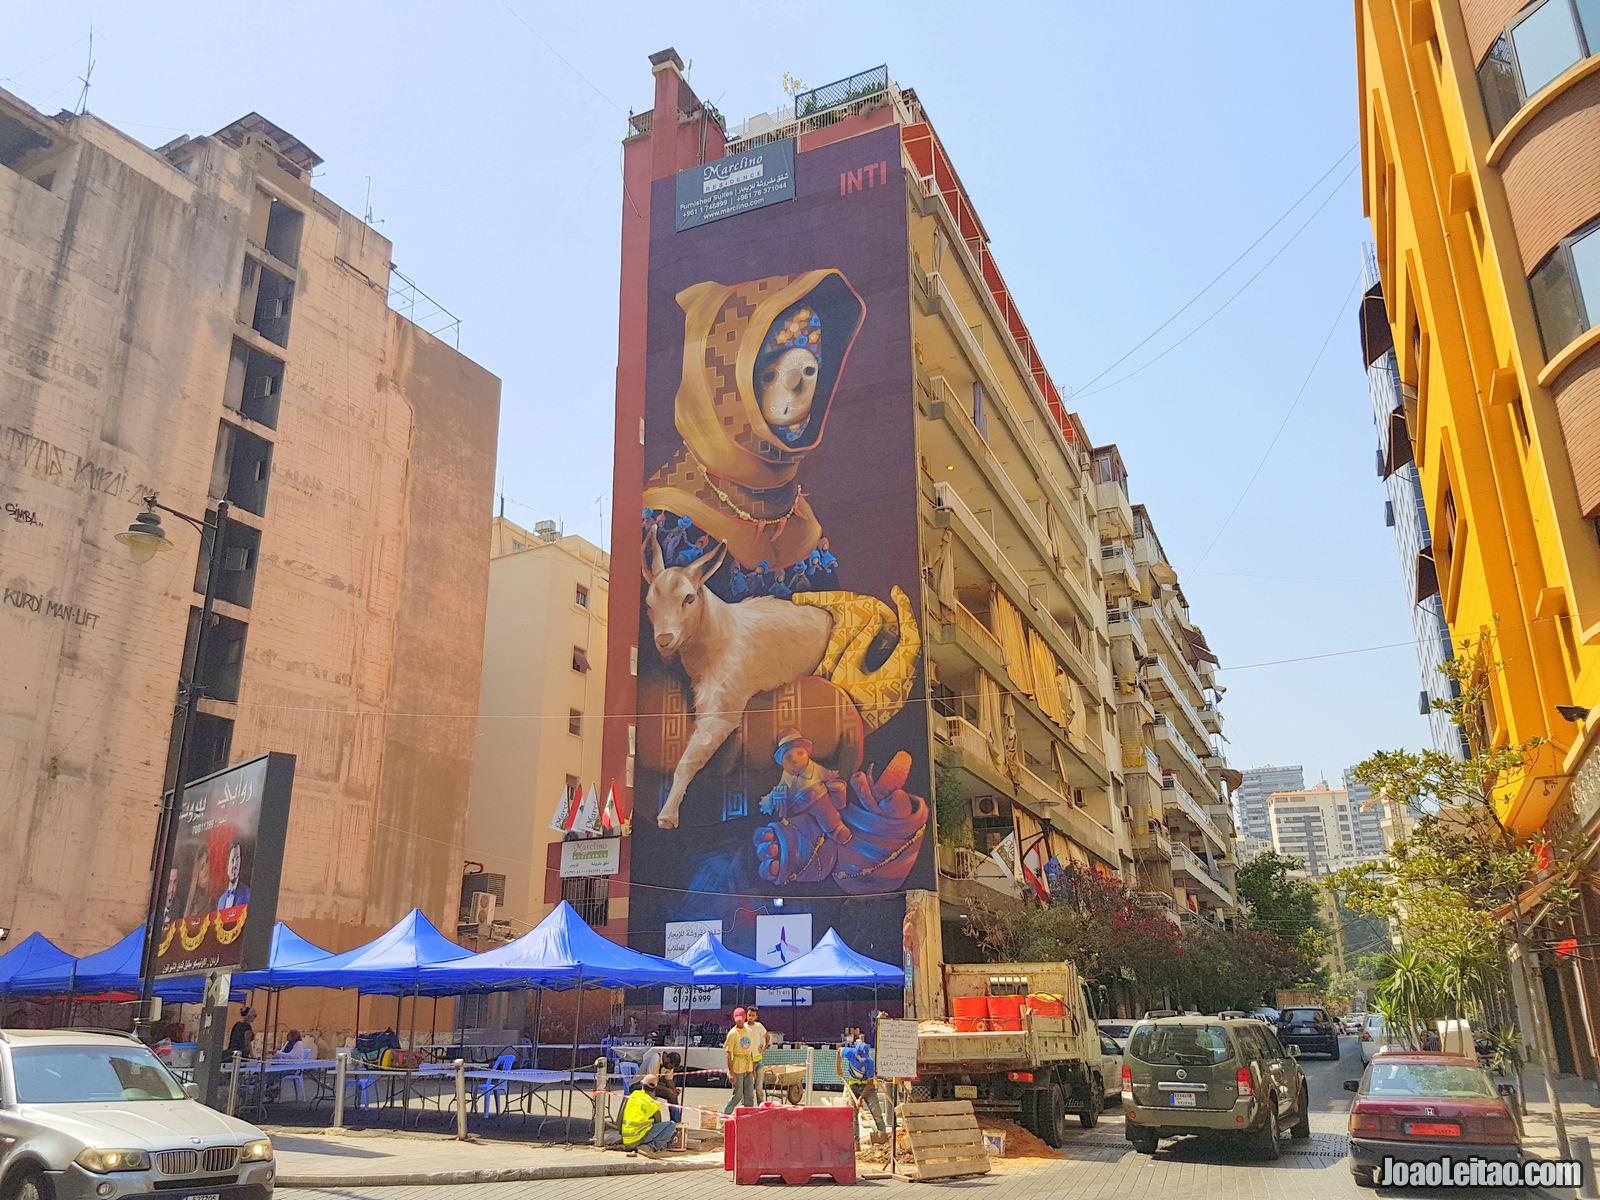 FOTO DE BEIRUTE NO LIBANO